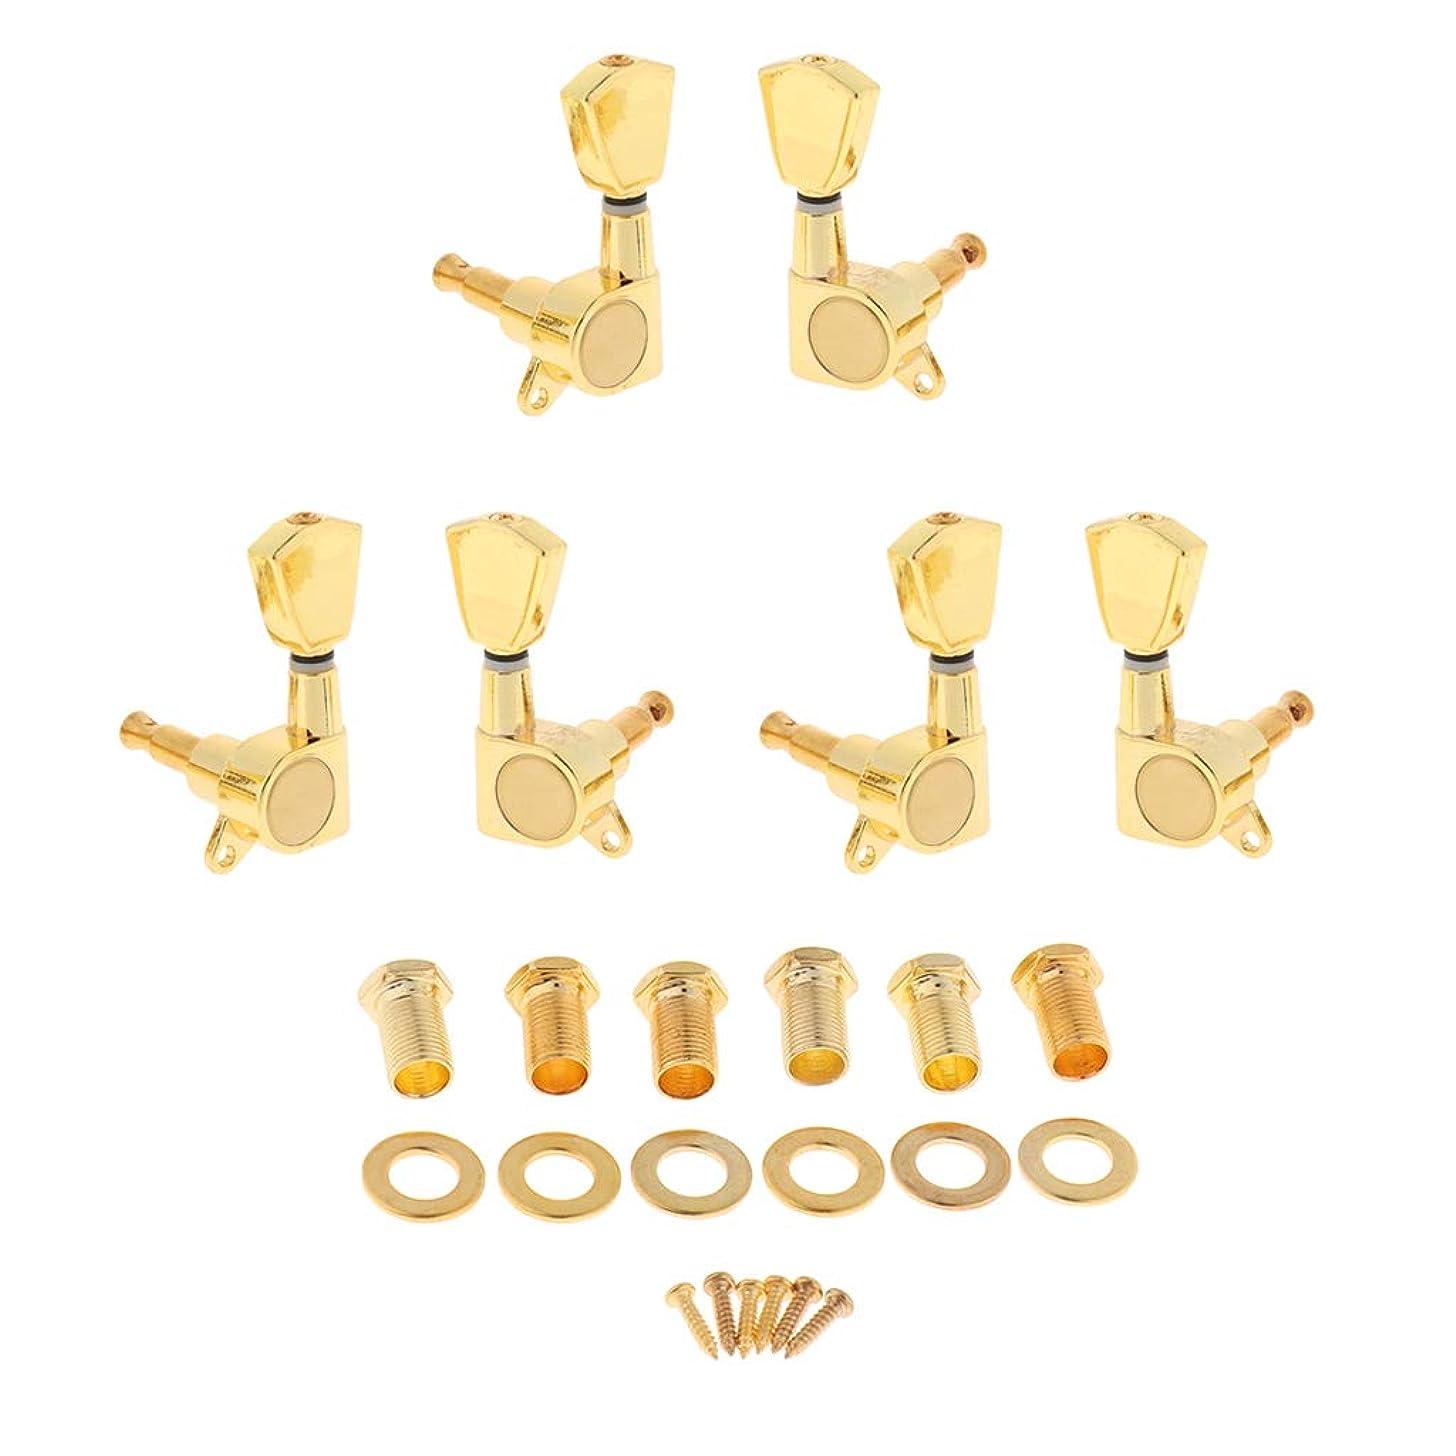 Flameer 1set of 6pcs Golden Guitar Bass Tuner Machine Heads Tuning Pegs